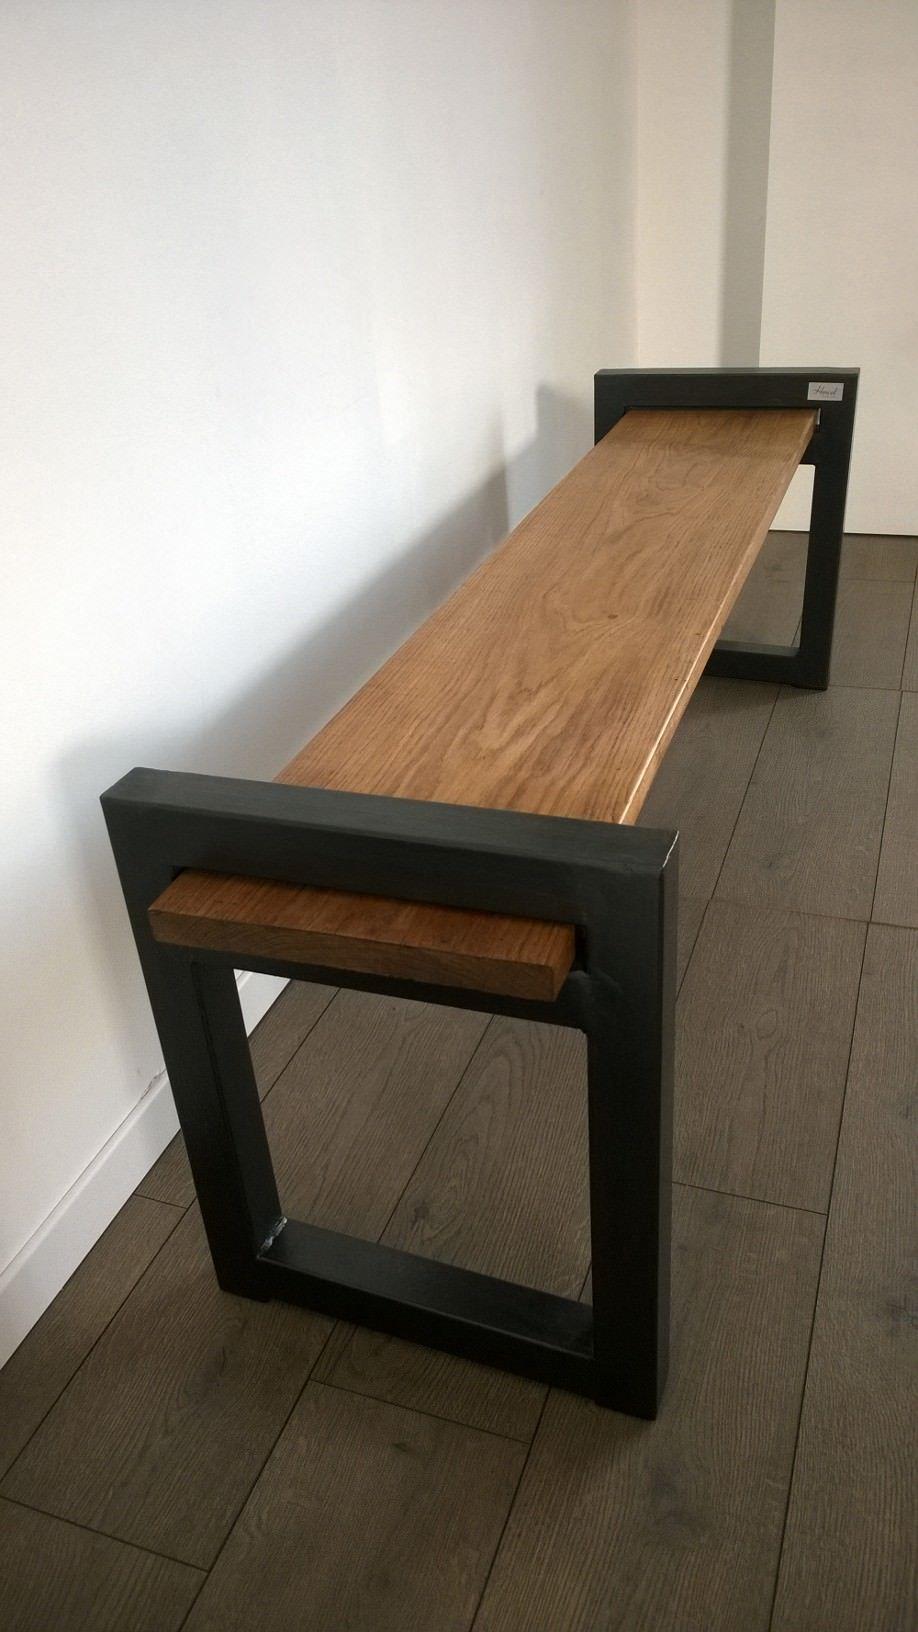 Banc Industriel Design Wood Metal Industrial Bench Serralheria